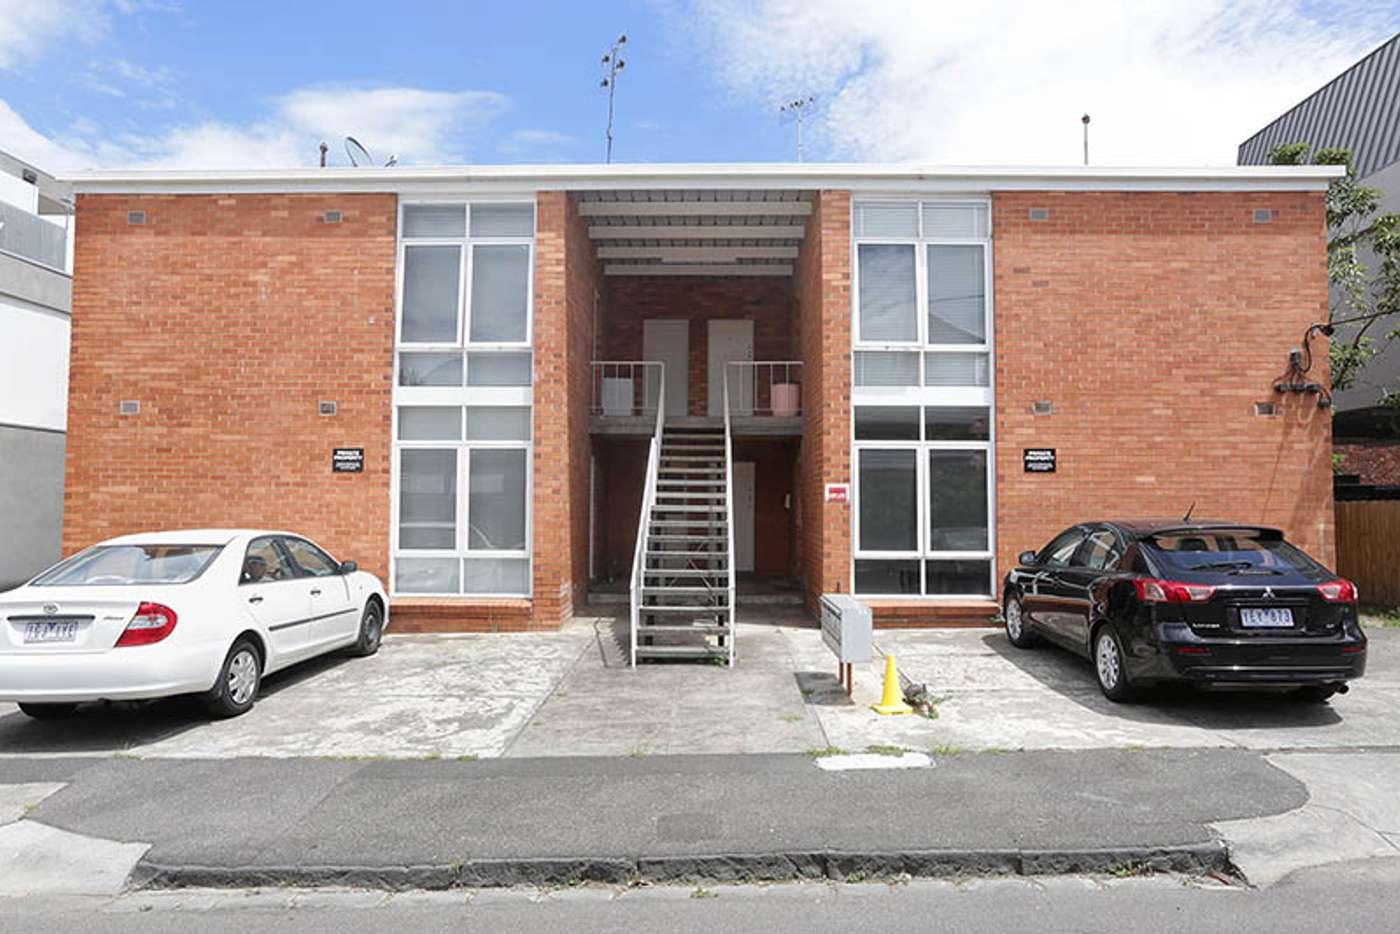 Main view of Homely studio listing, 4/10-12 Carroll Street, Richmond VIC 3121